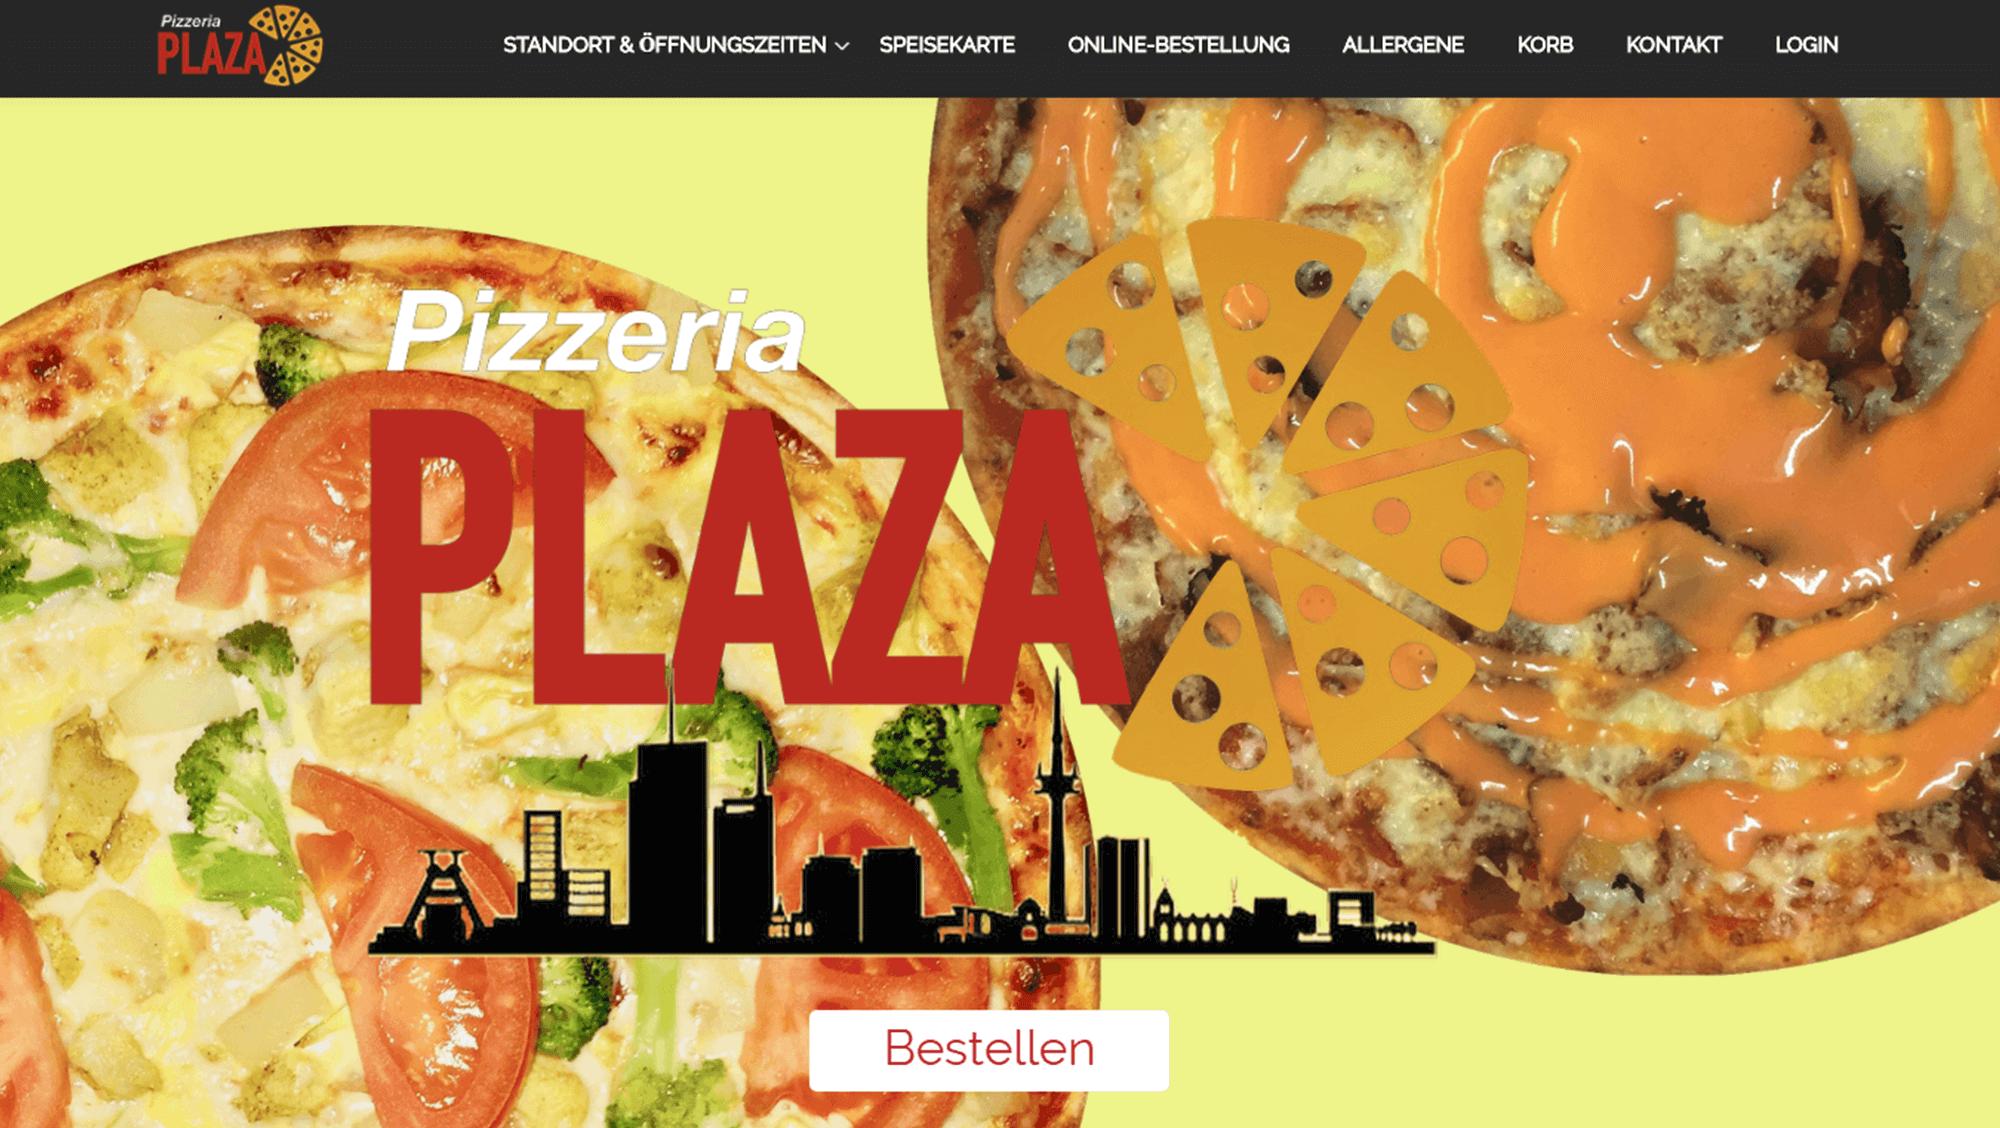 pizza-plaza_header